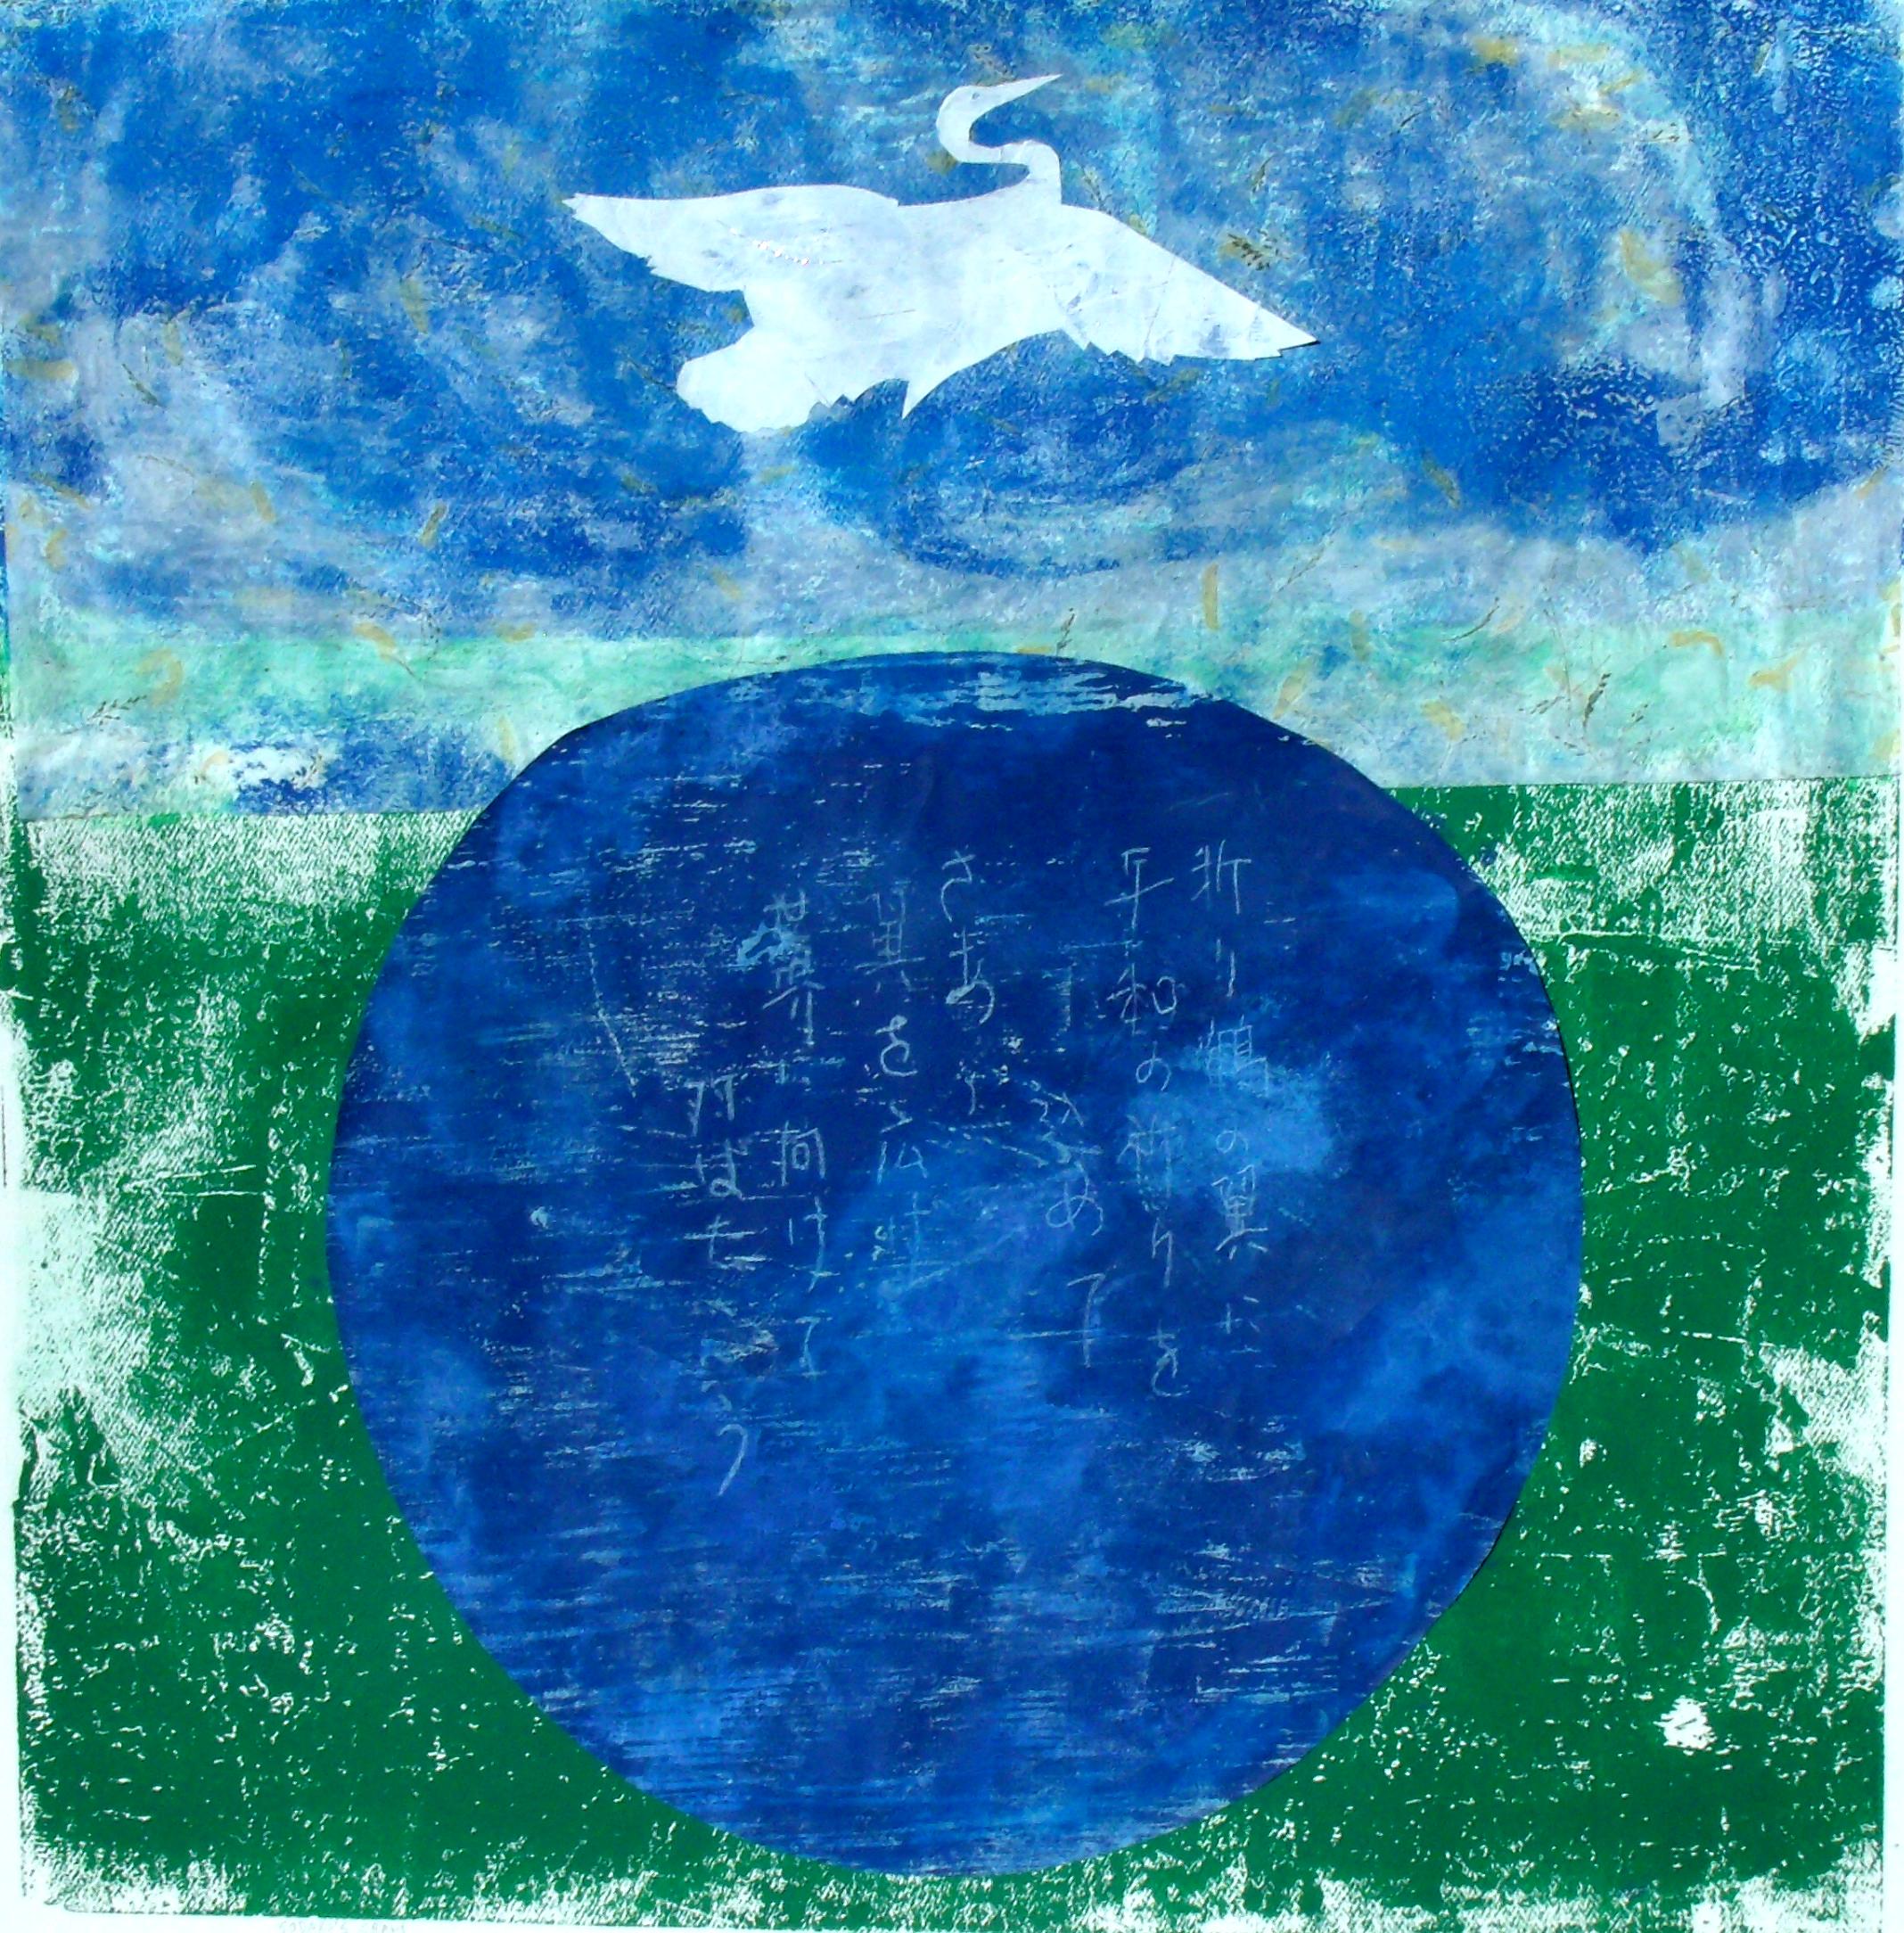 Sodaka's Crane